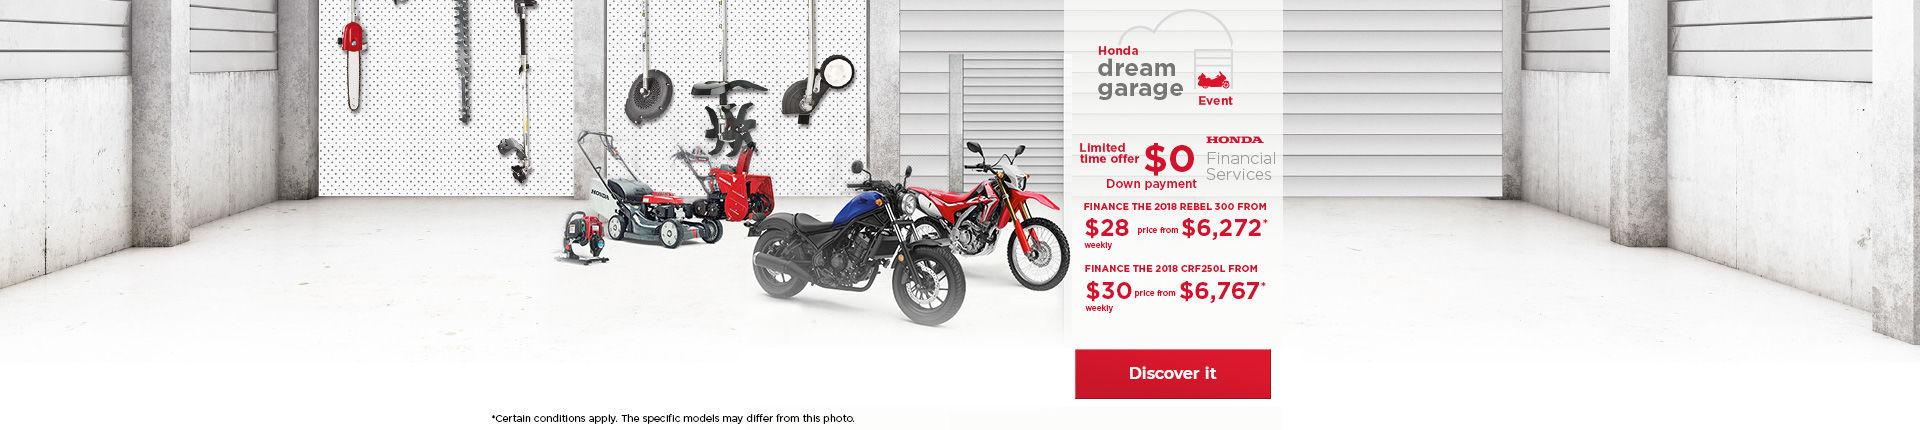 Honda Dream Garage on Motorcycles